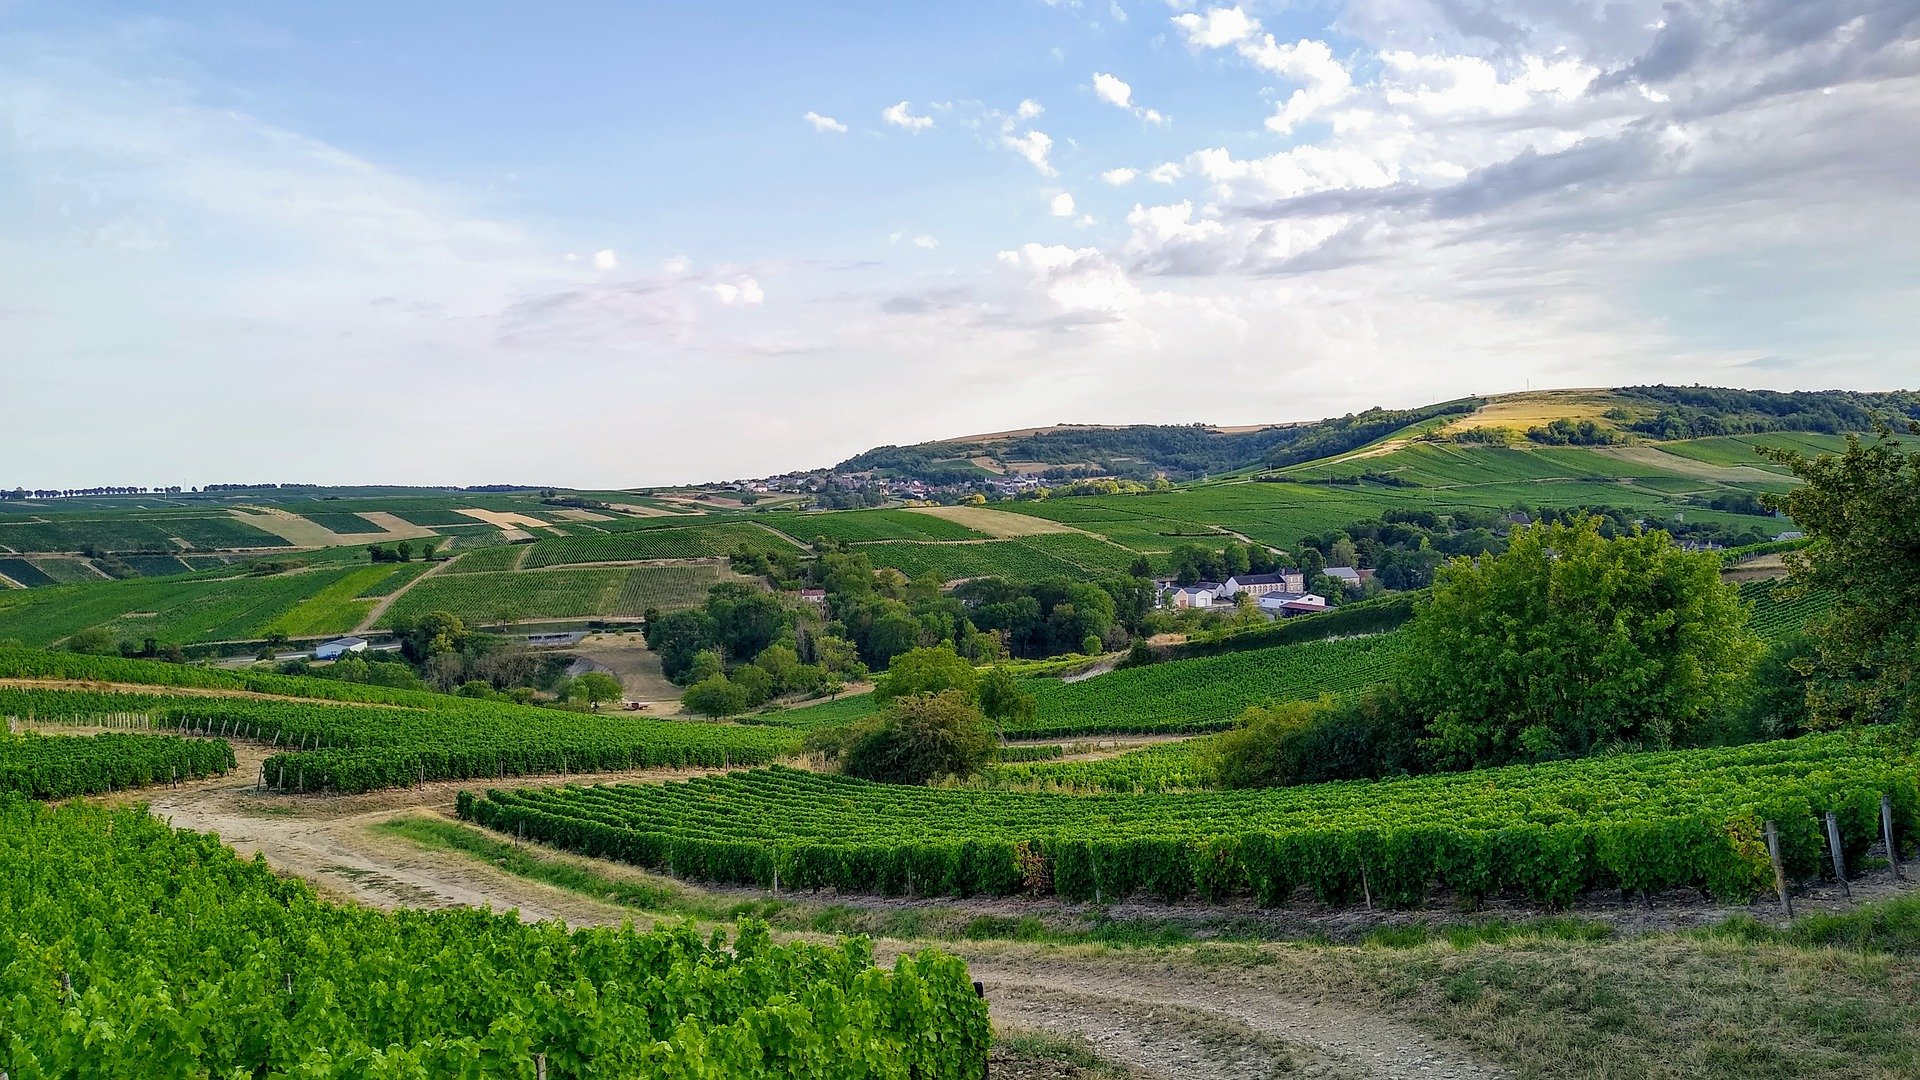 vineyards-5480243_1920